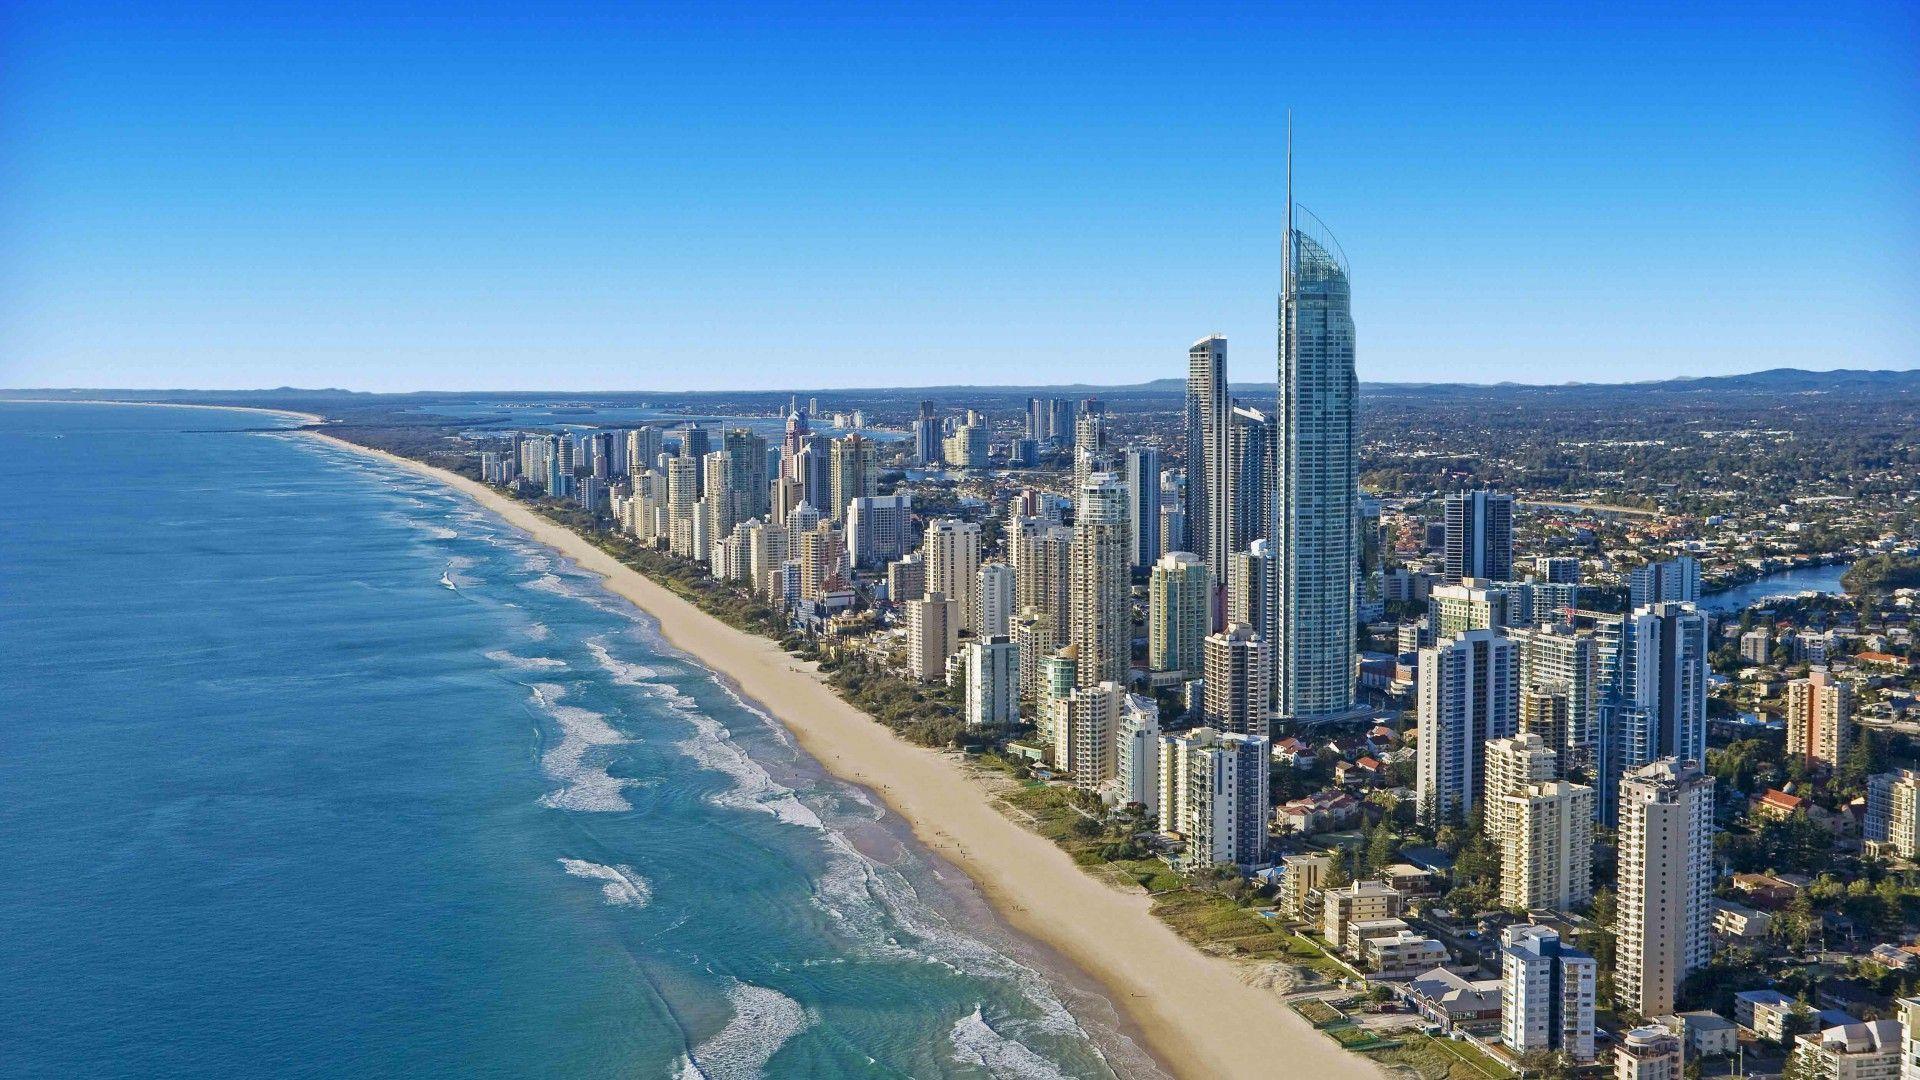 1920x1080 خلفية شاطئ أستراليا [1920x1080]